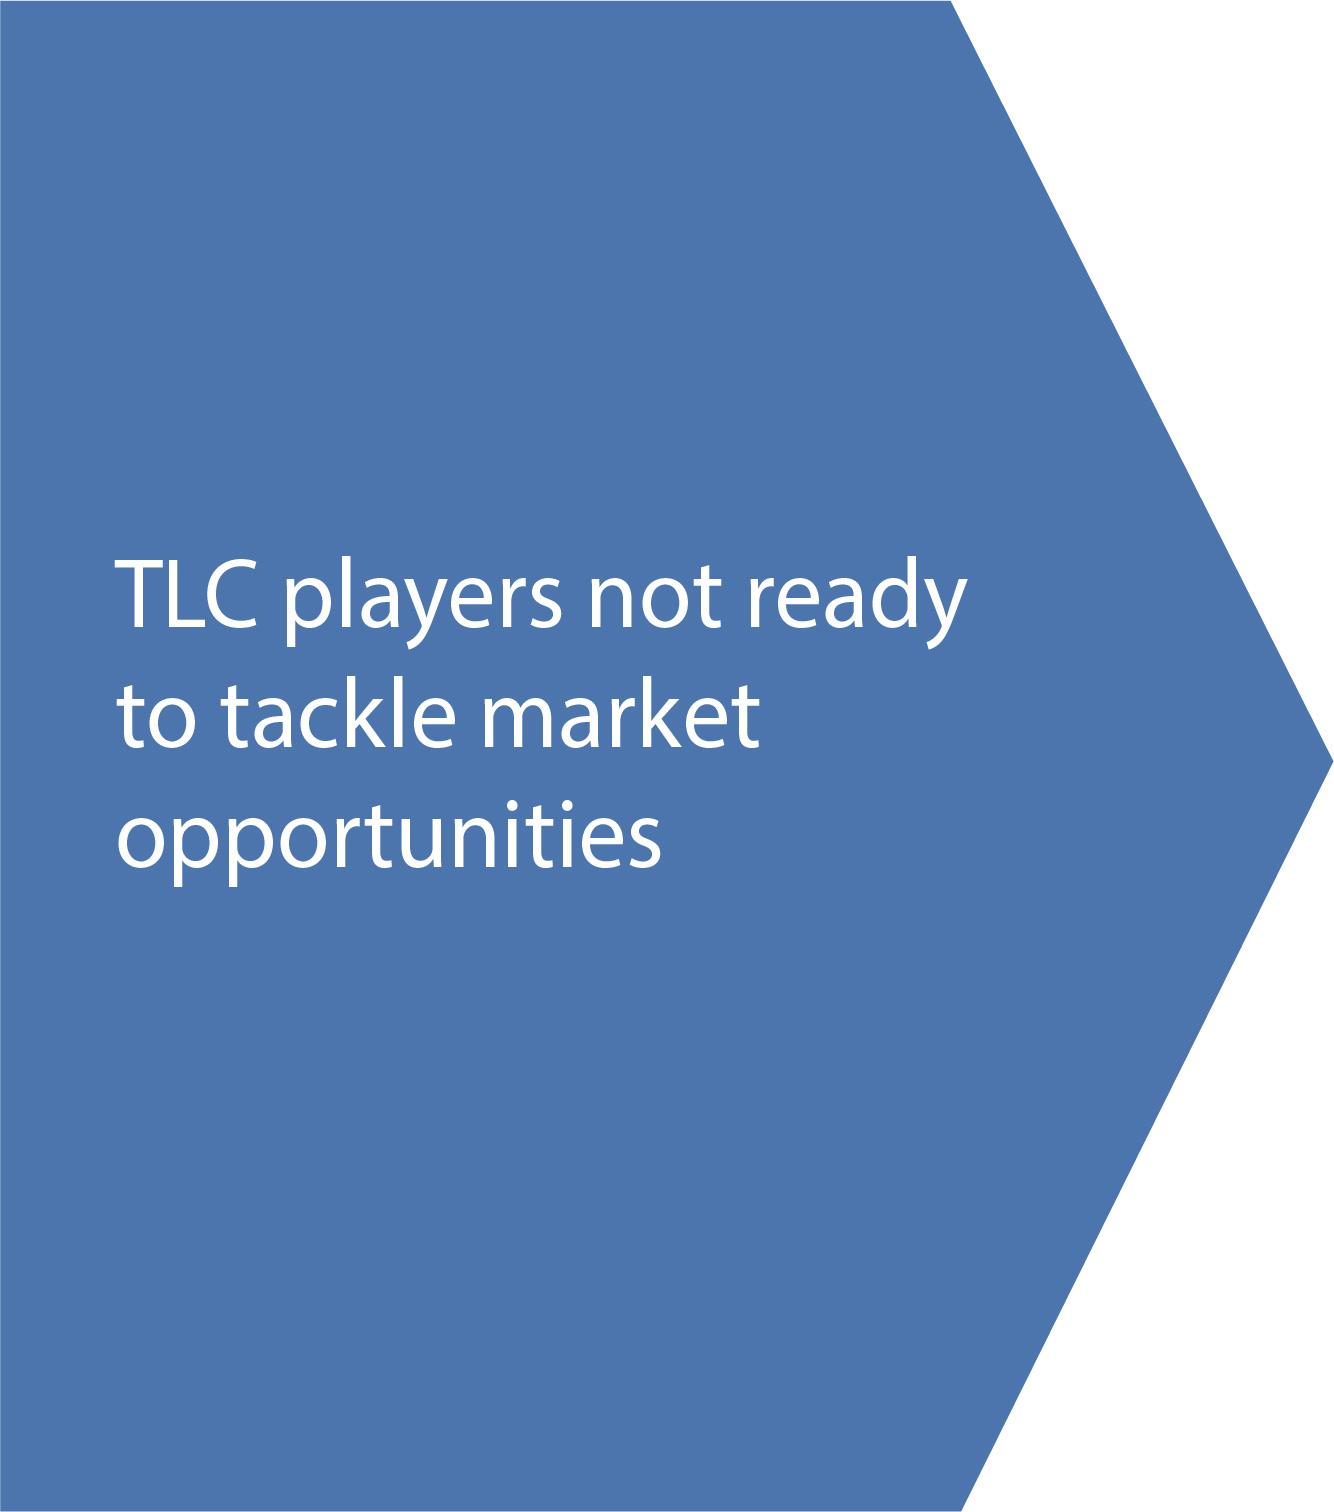 tlc players